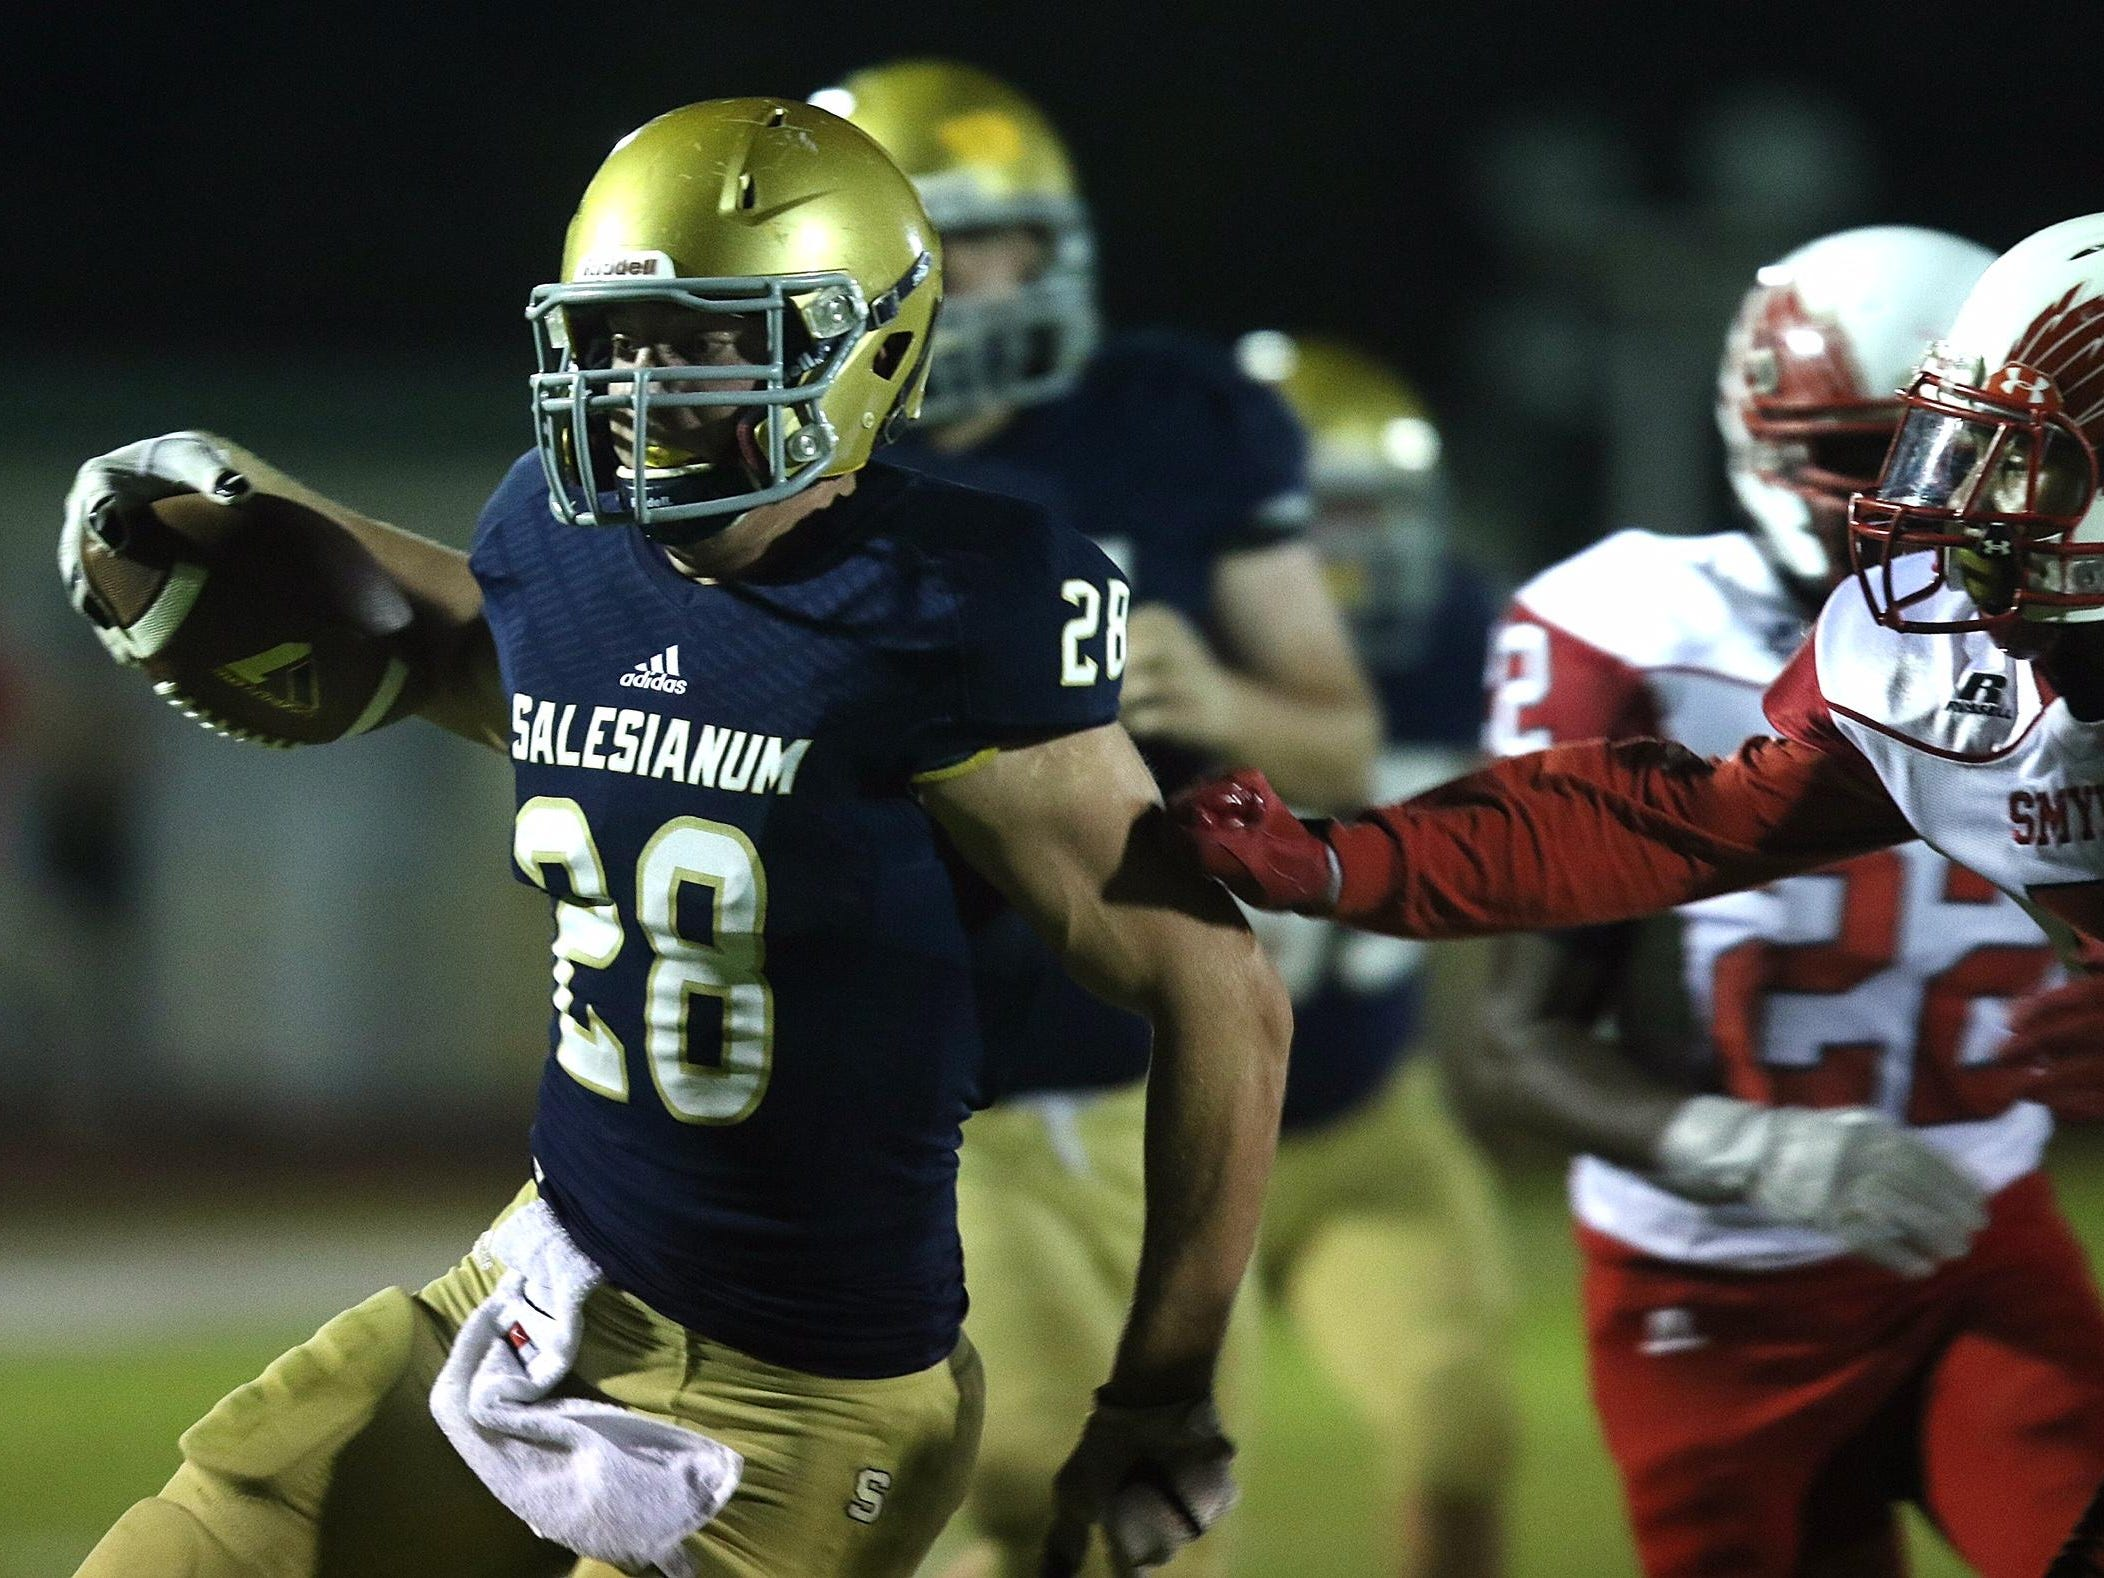 Salesianum senior Colby Reeder breaks away for a first-quarter touchdown run in Friday night's game against Smyrna at Baynard Stadium.